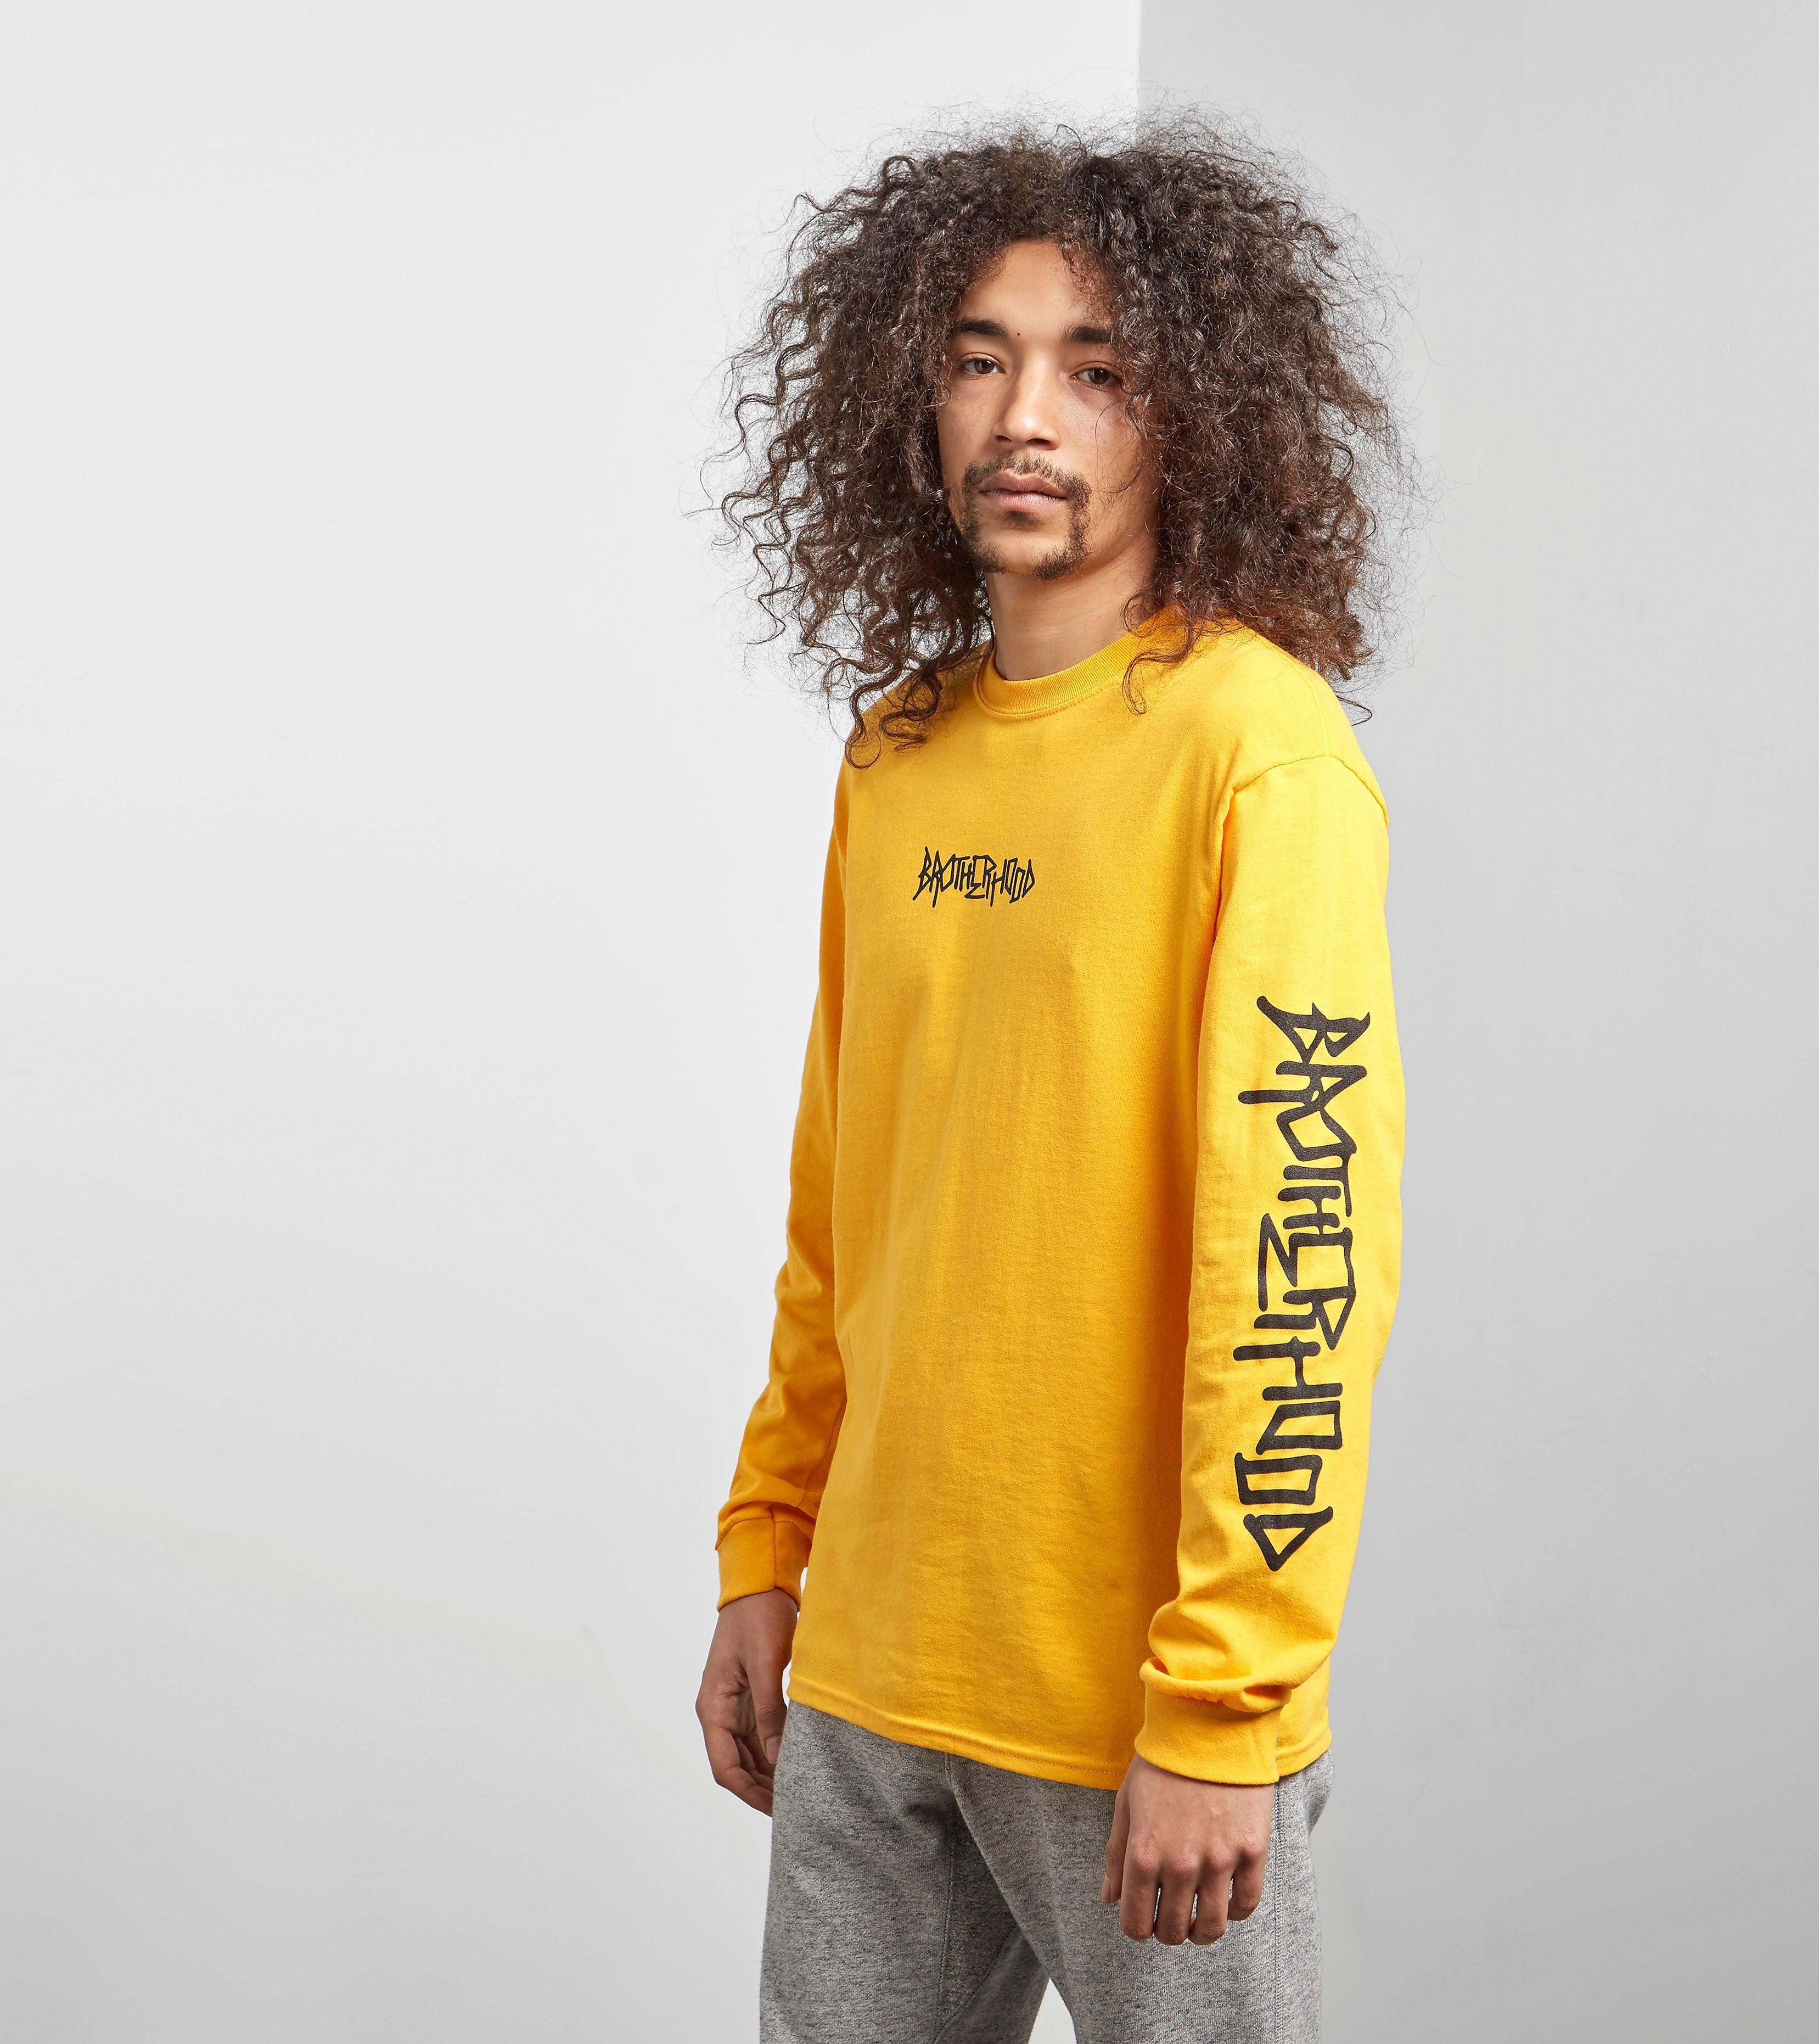 Brotherhood Iconic Long Sleeved T-Shirt, amarillo/negro